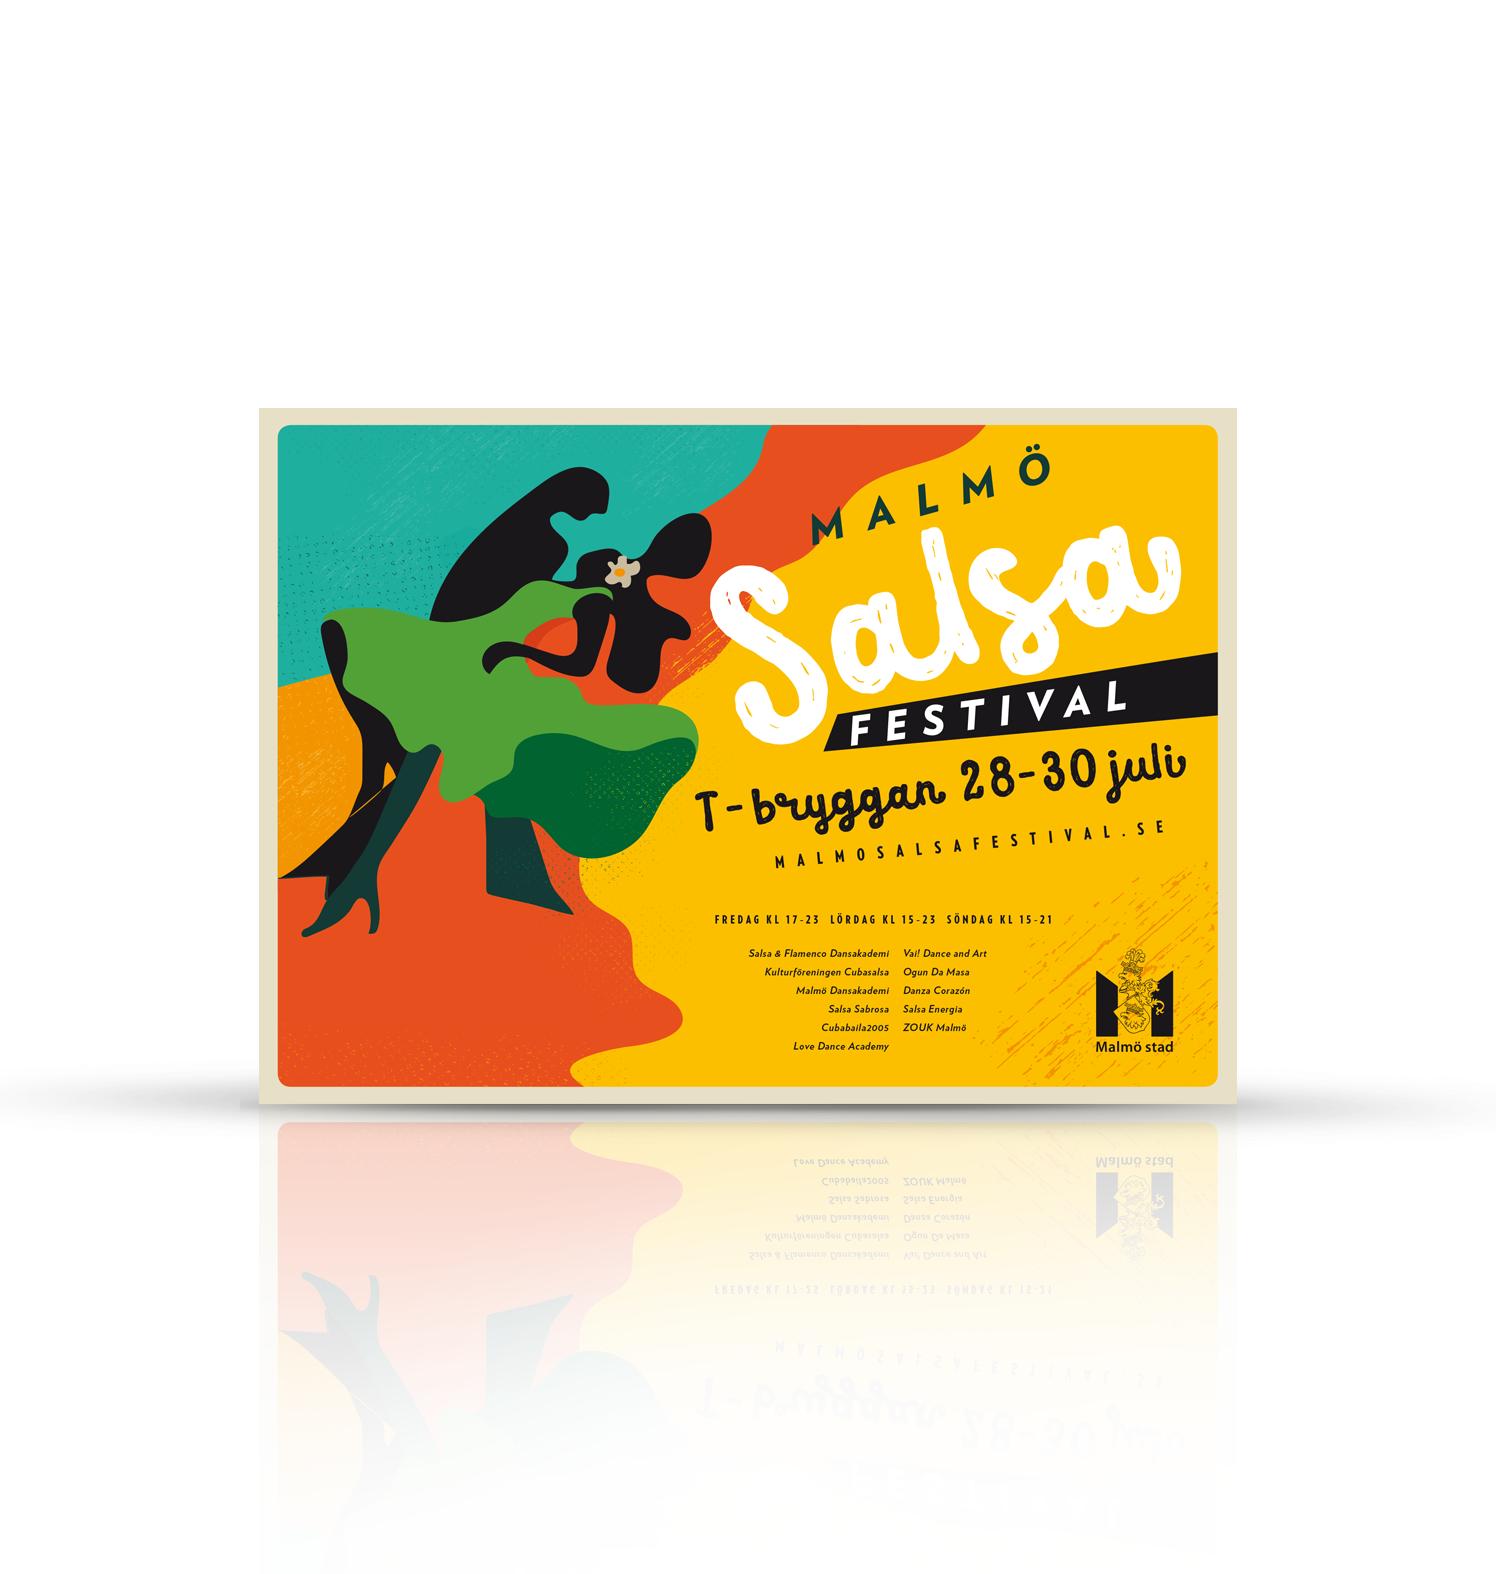 Malmö Salsa Festival 2017